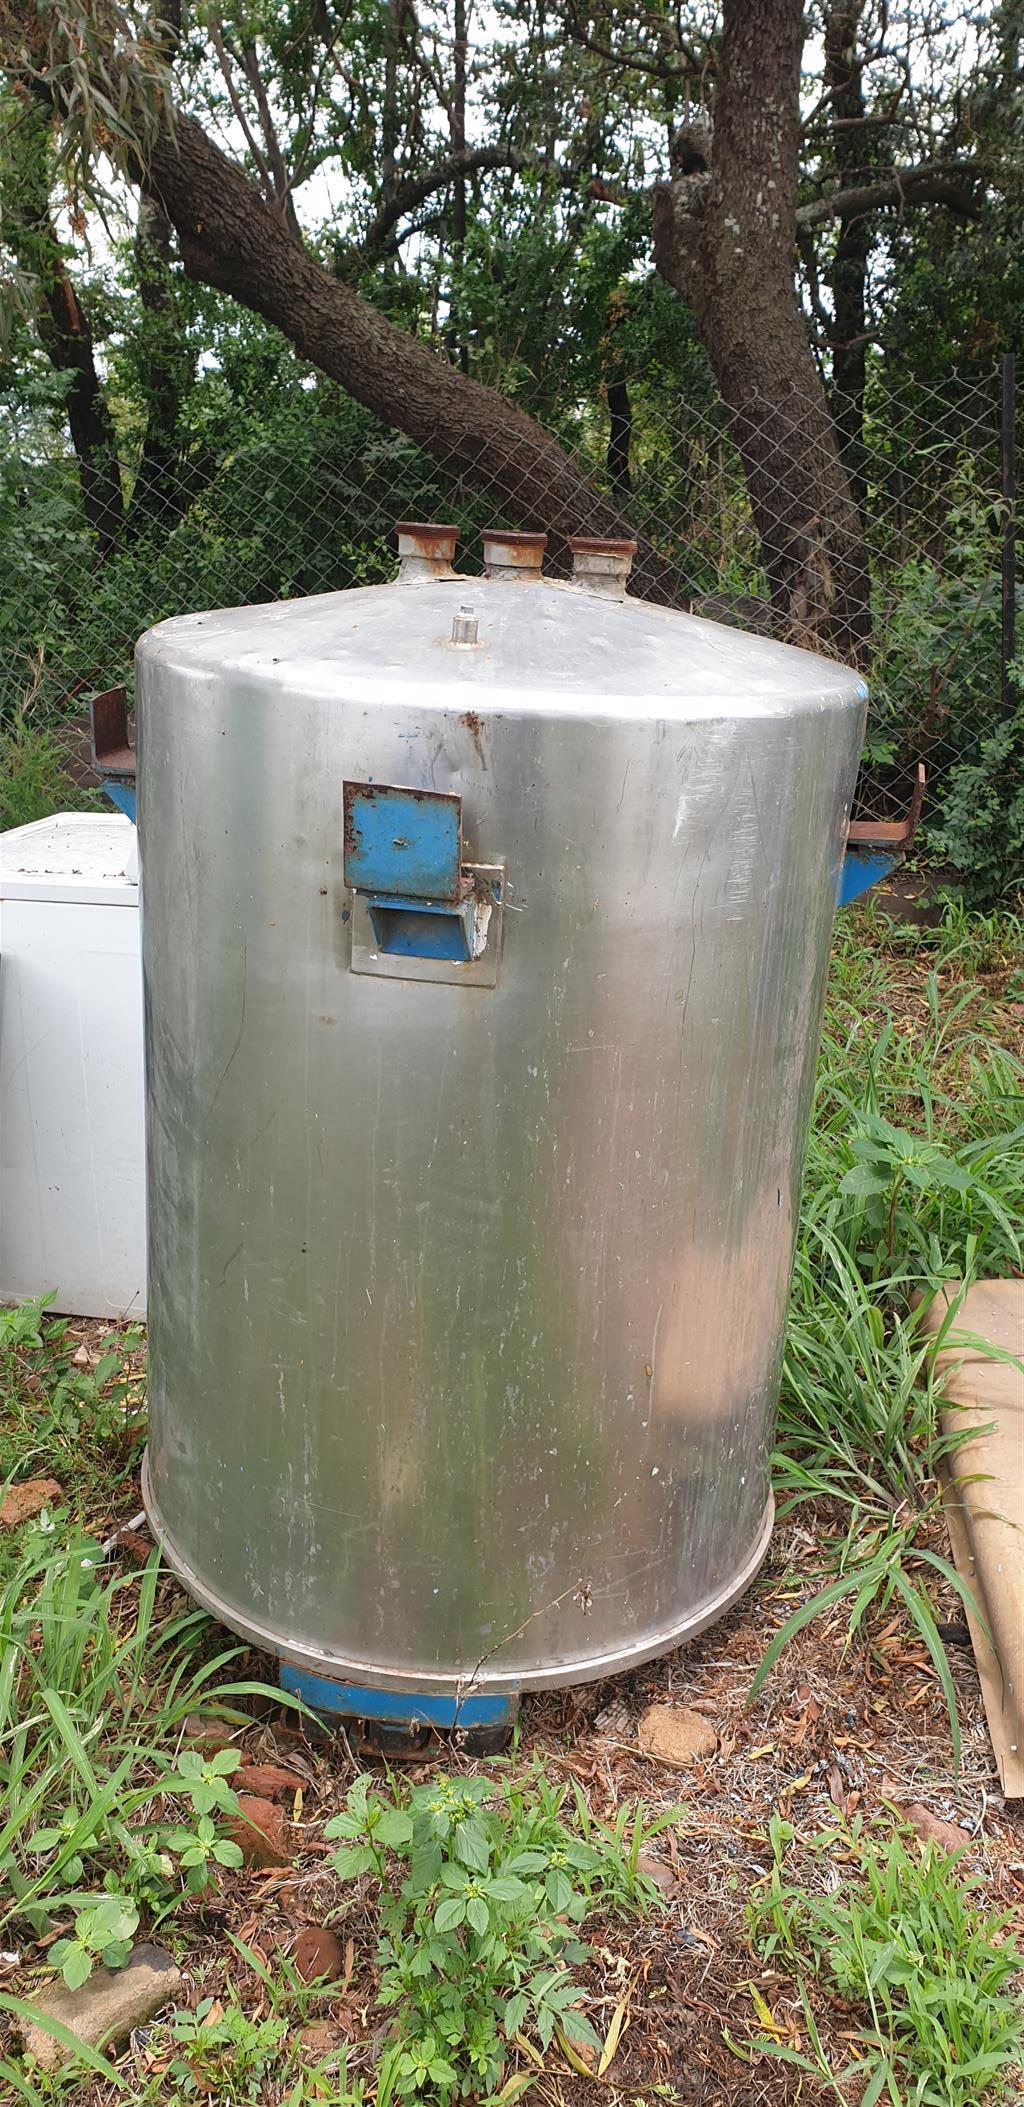 Stainless steel tank 1.2m highx900diameter